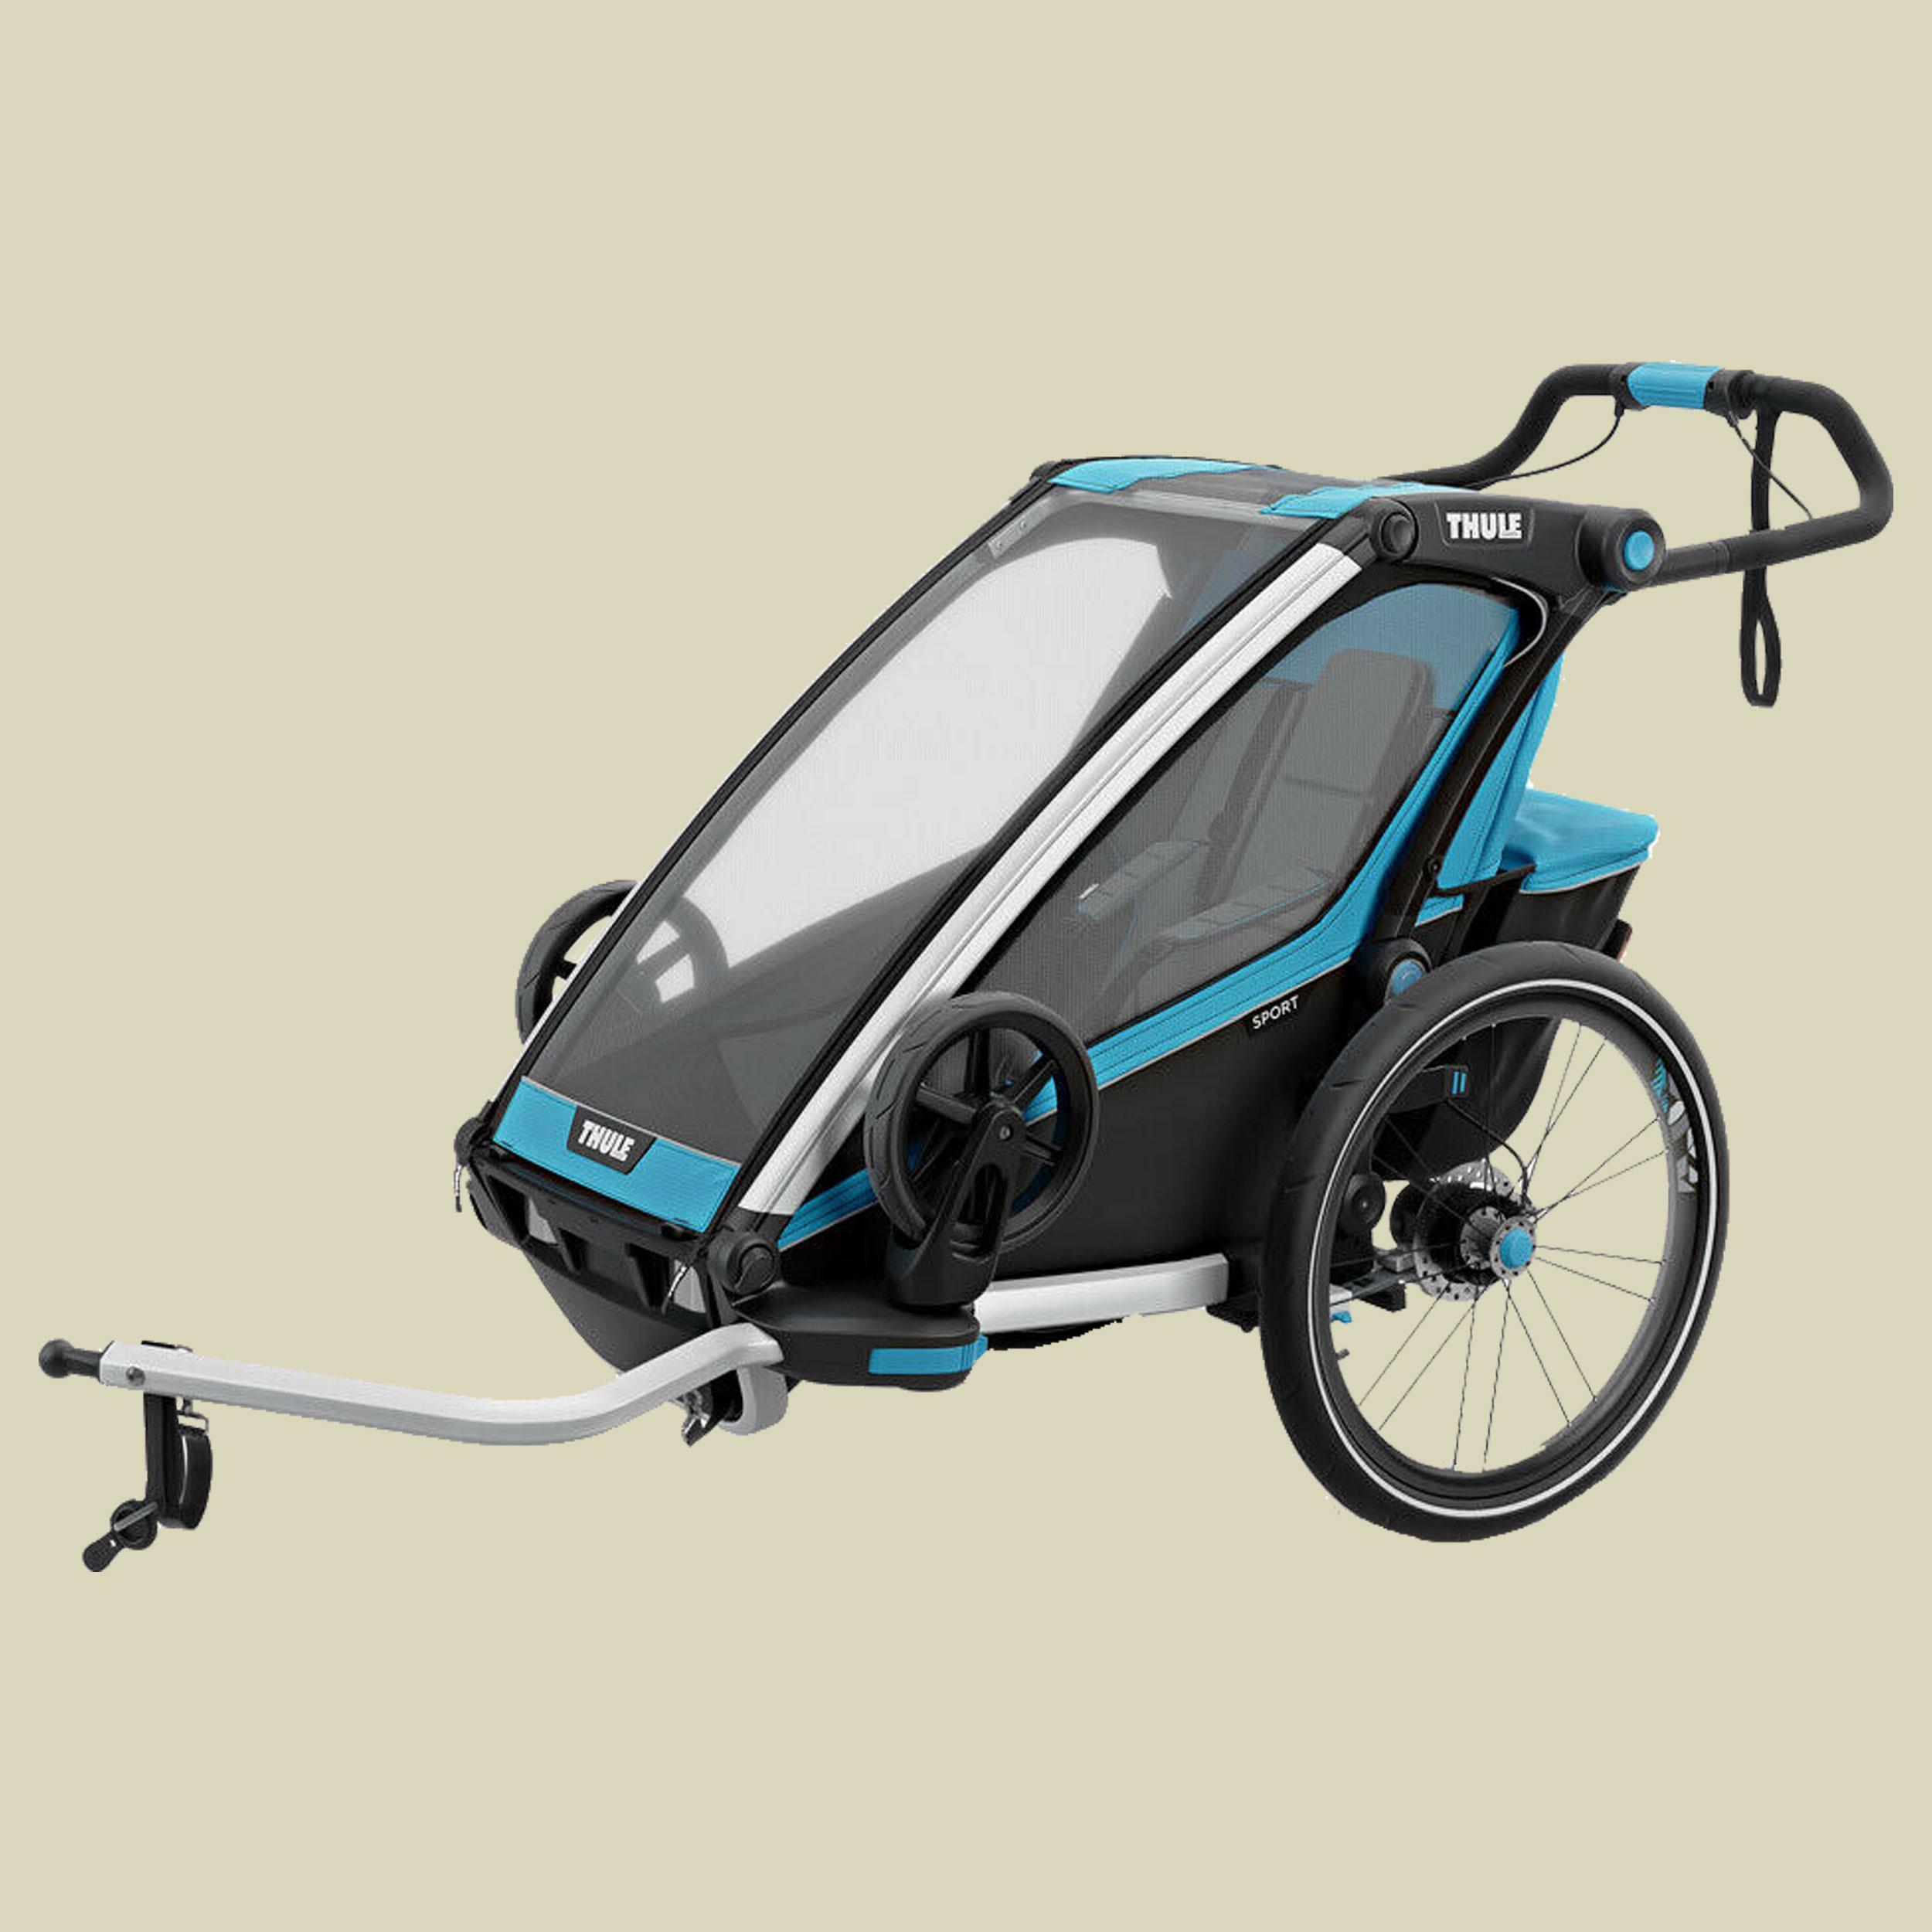 Thule, Chariot Sport 1 mit StVZO-Beleuchtung, thule blue/black, Kindertransporter,